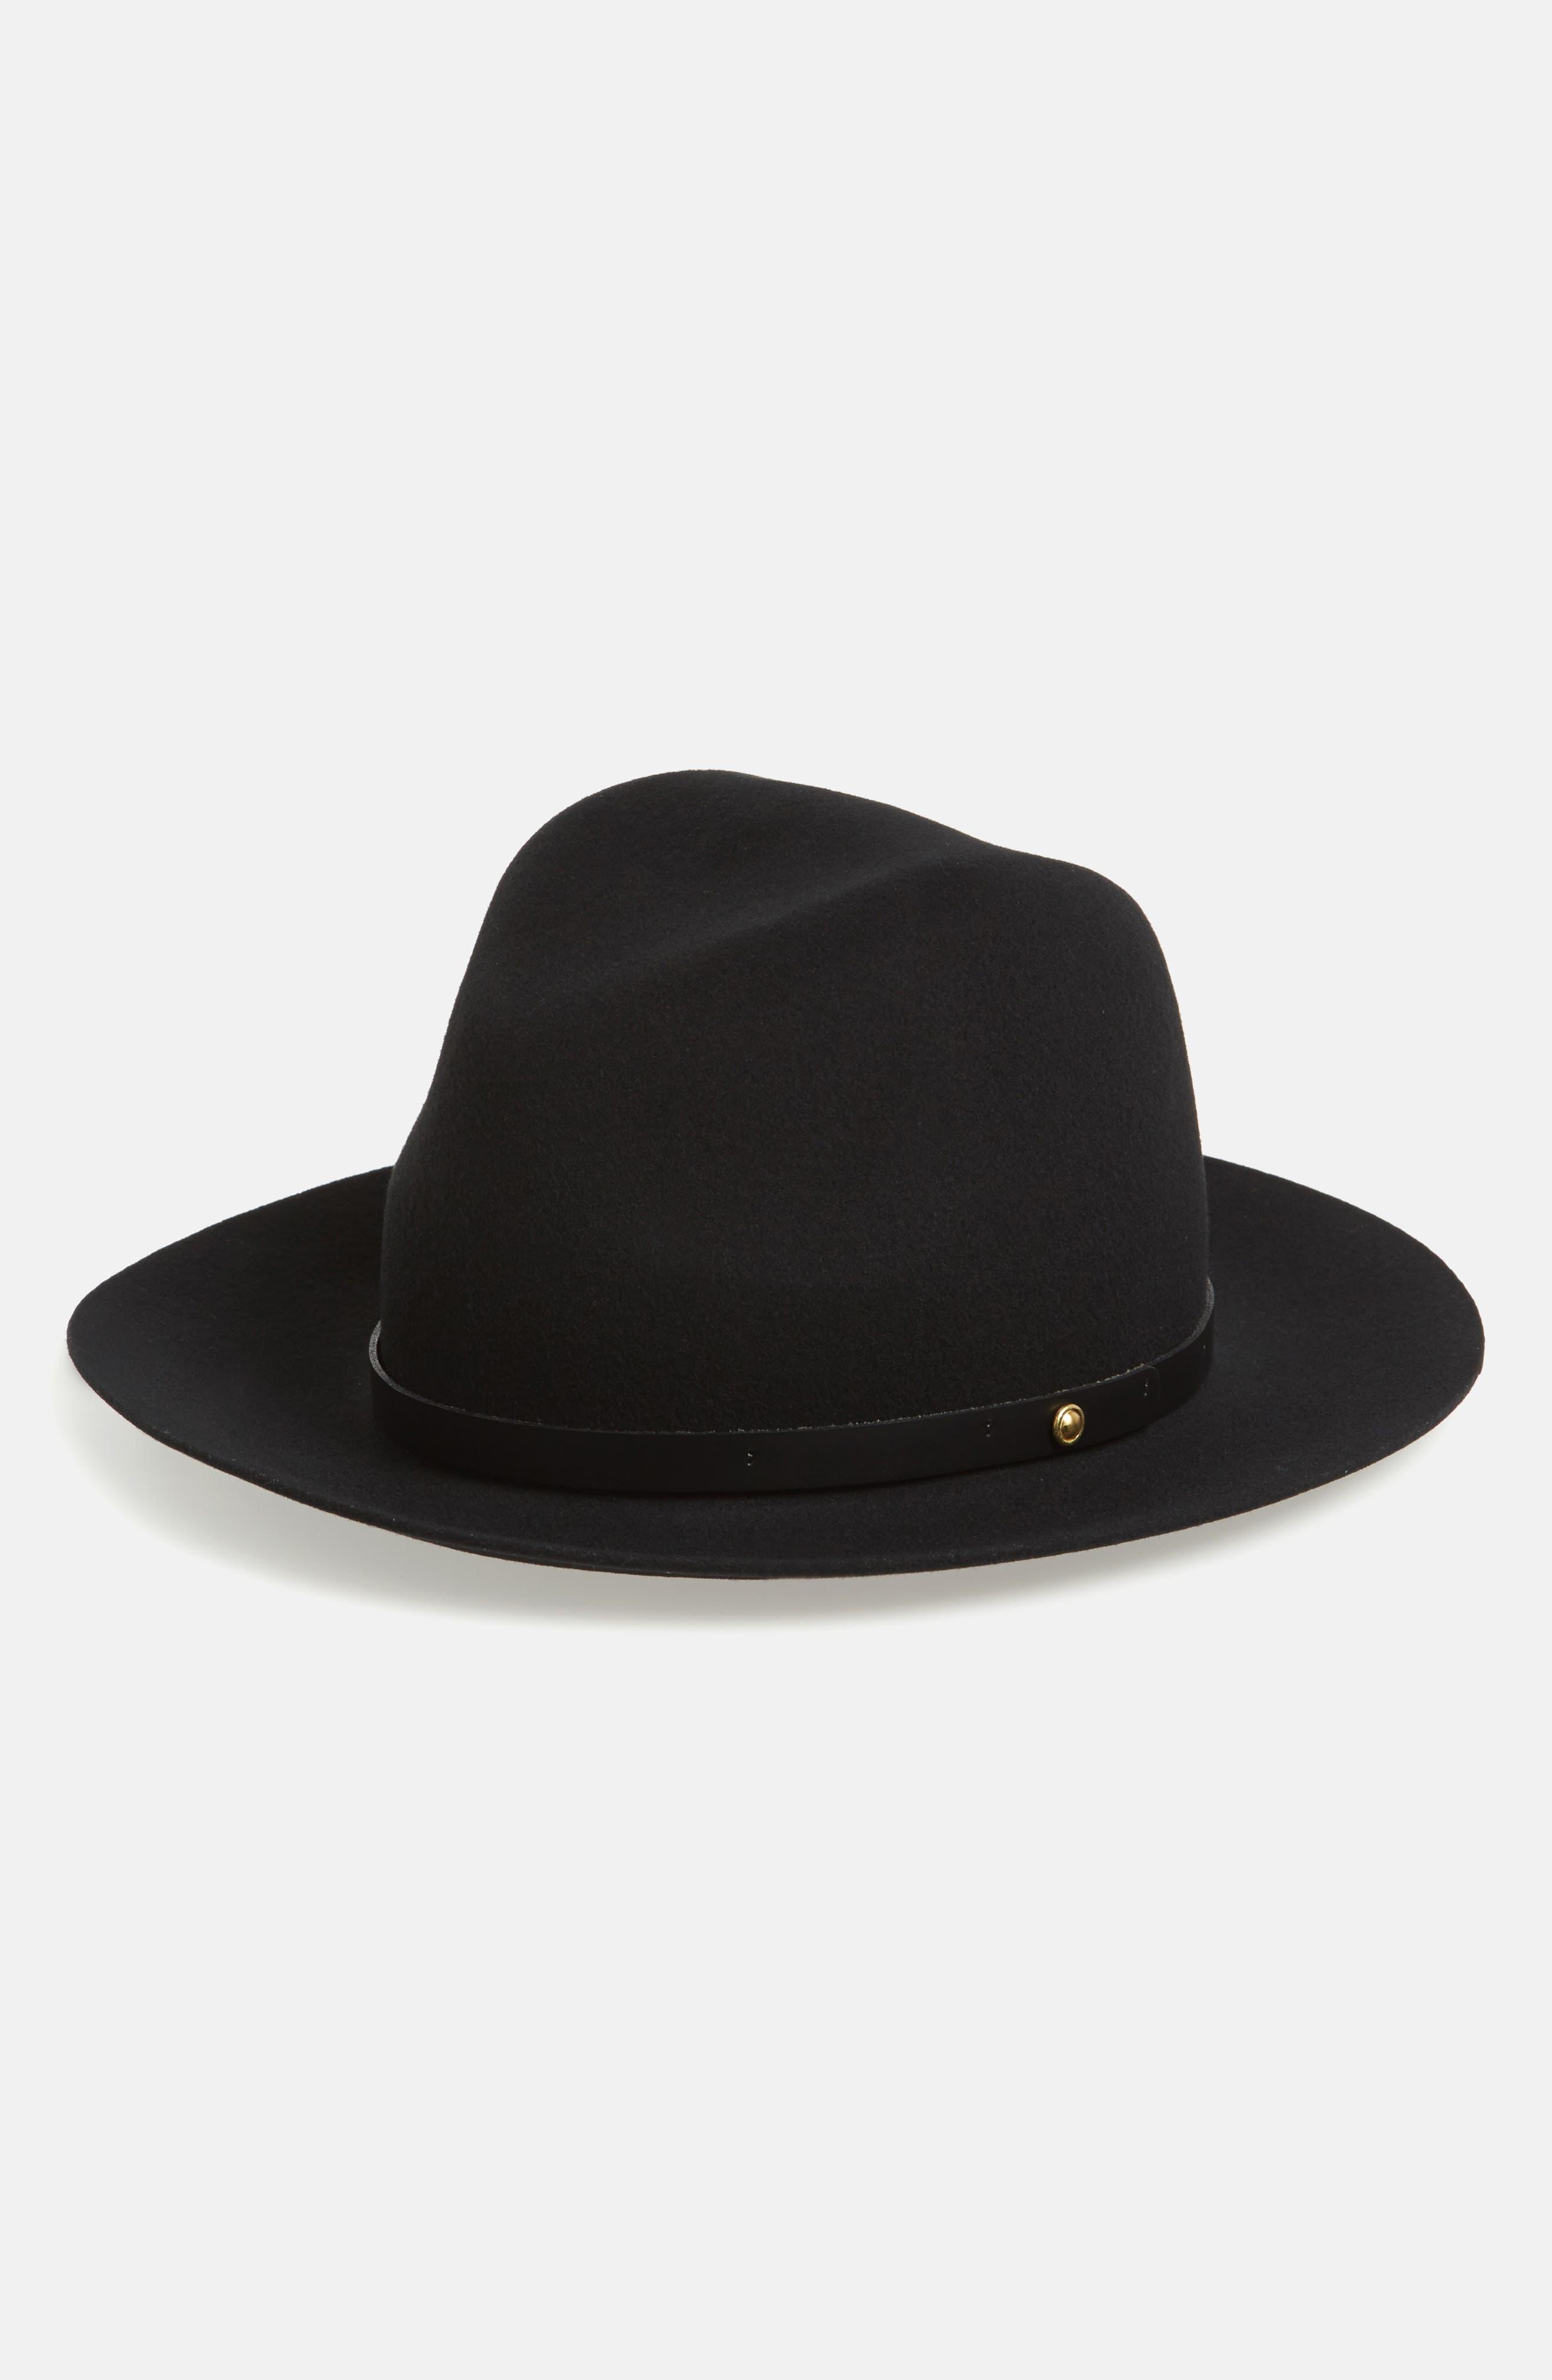 8cfa5a1f0e0 Fedora Hats for Women